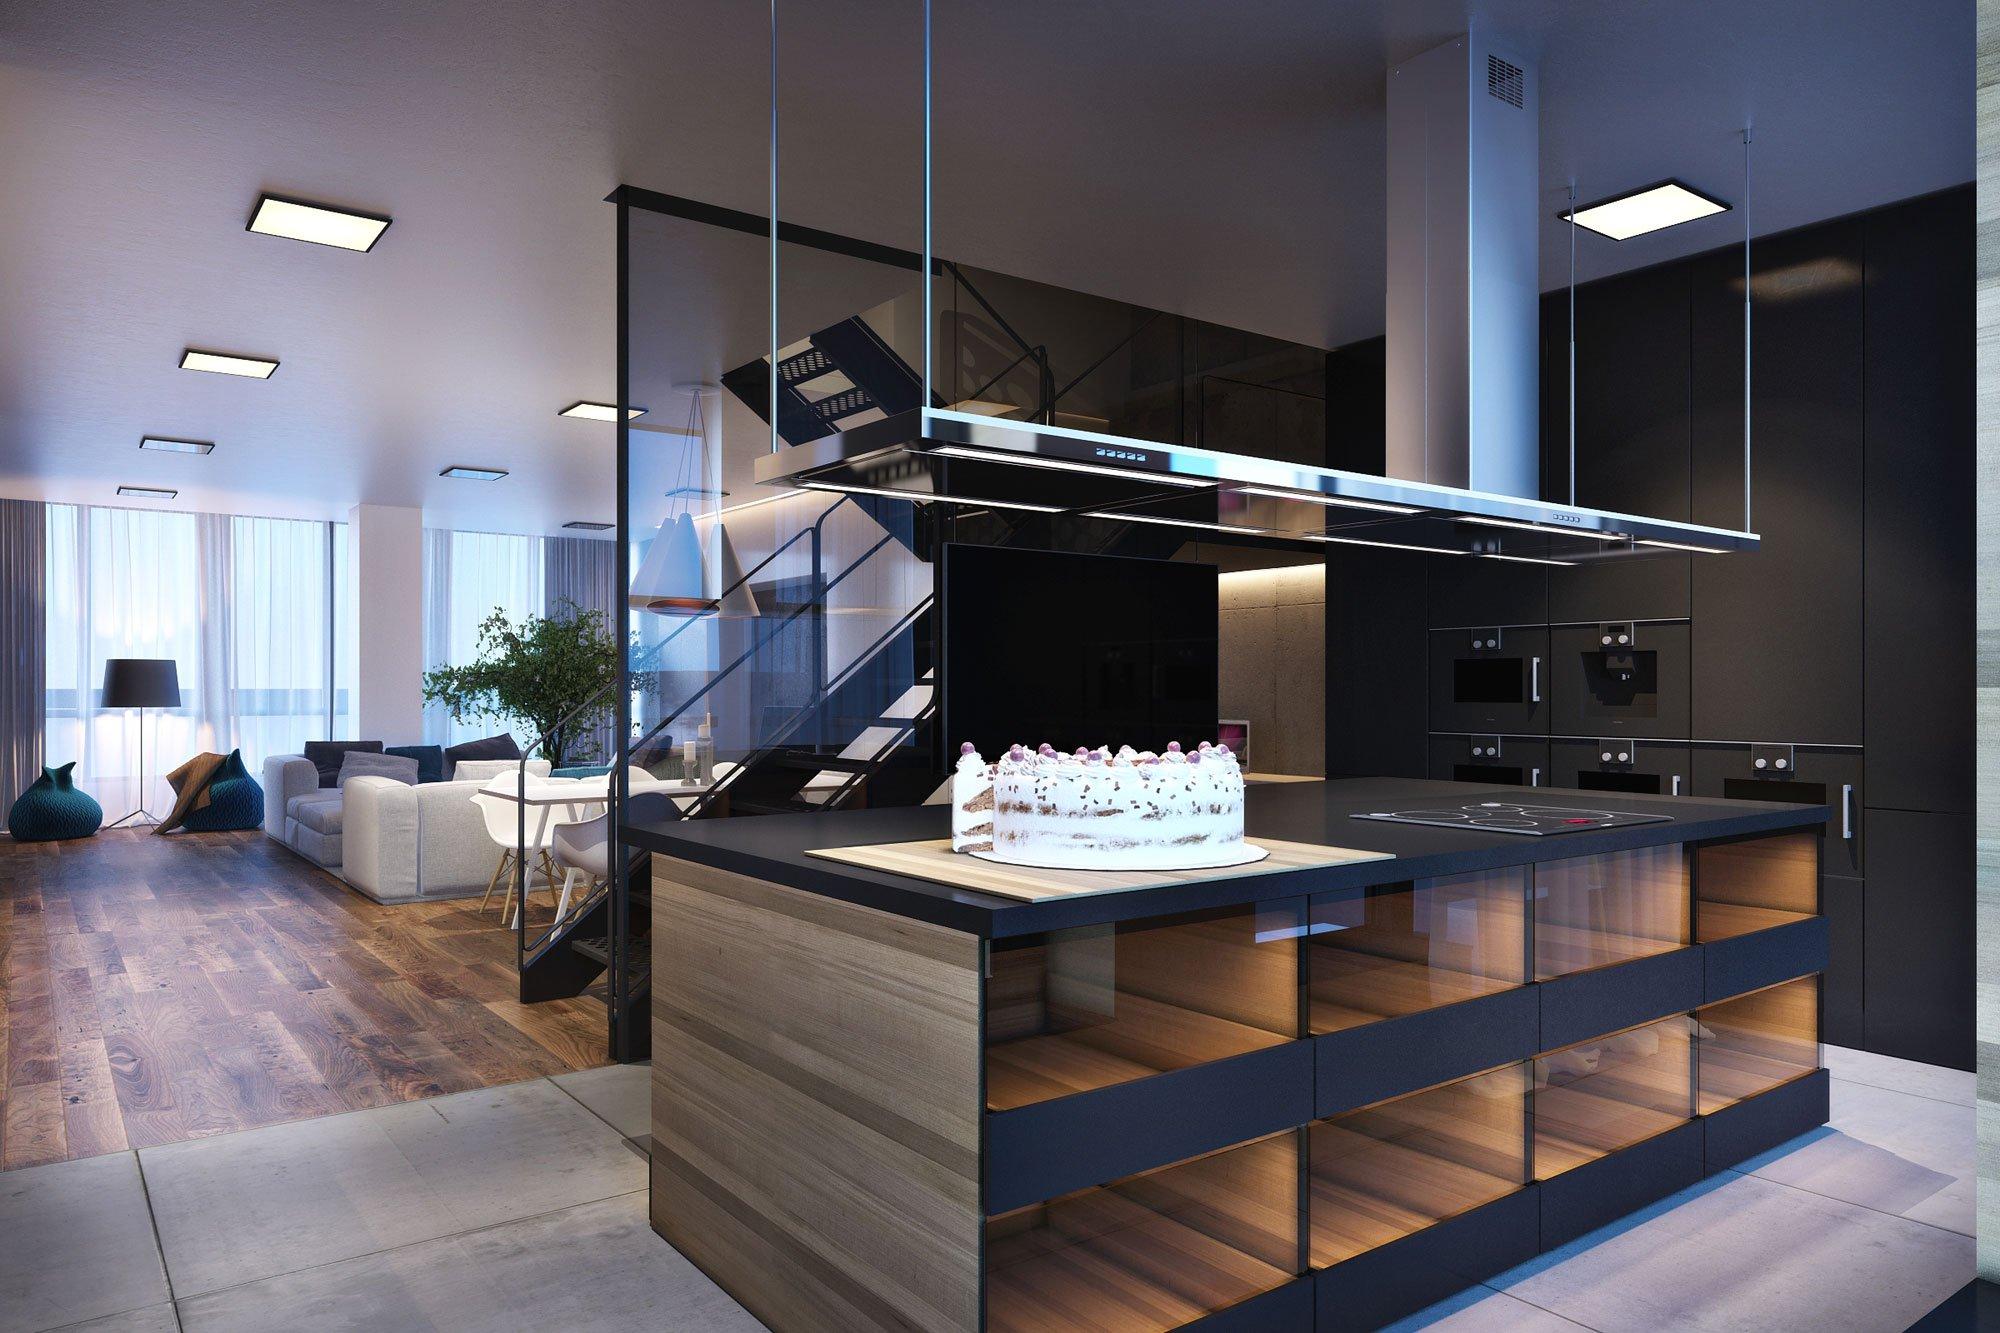 S Apartment Visualised By Igor Sirotov Caandesign